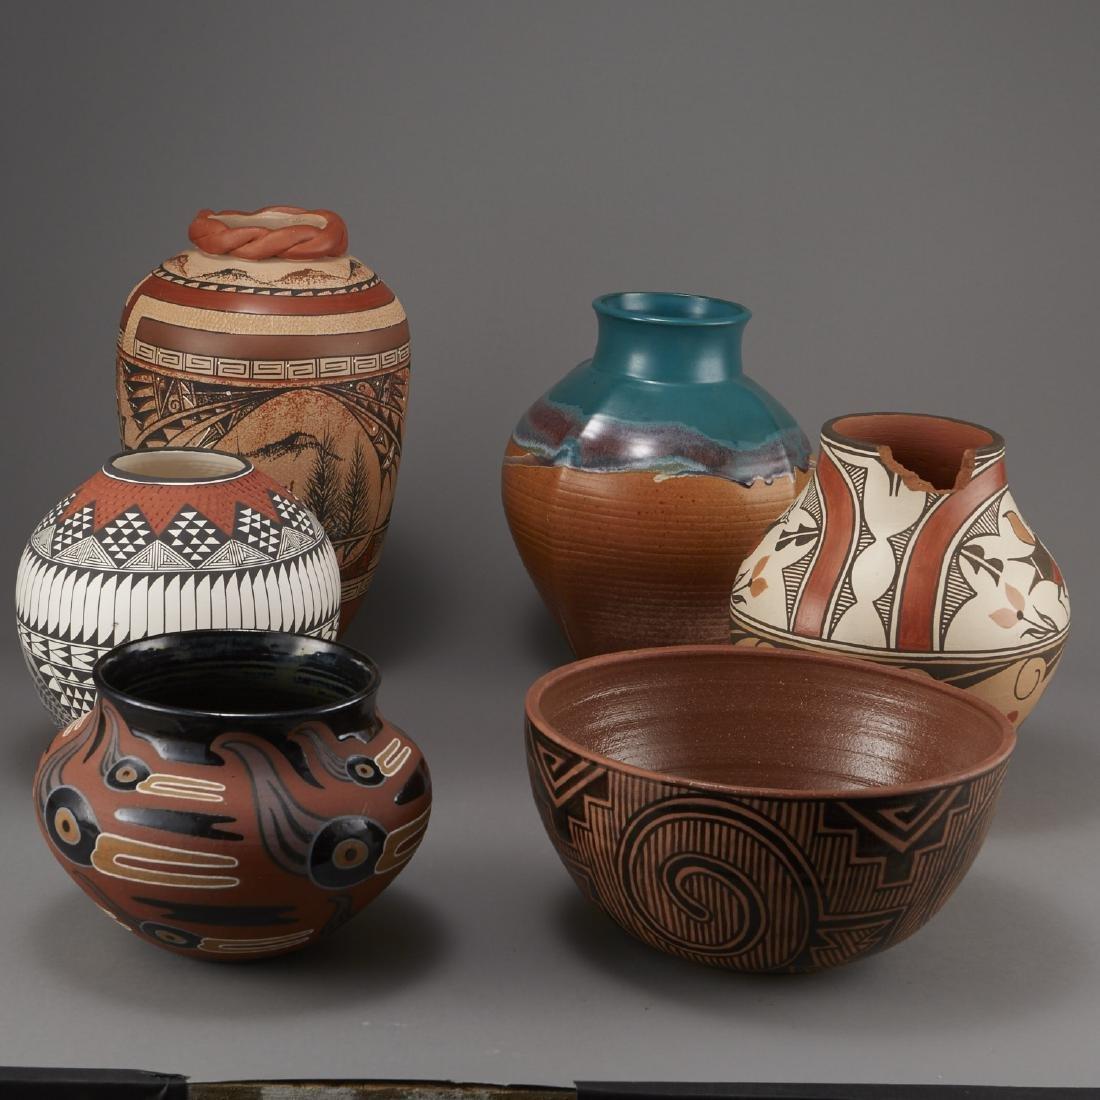 6 Pueblo Pottery Pots incld Fragua, Nez, Medina - 2